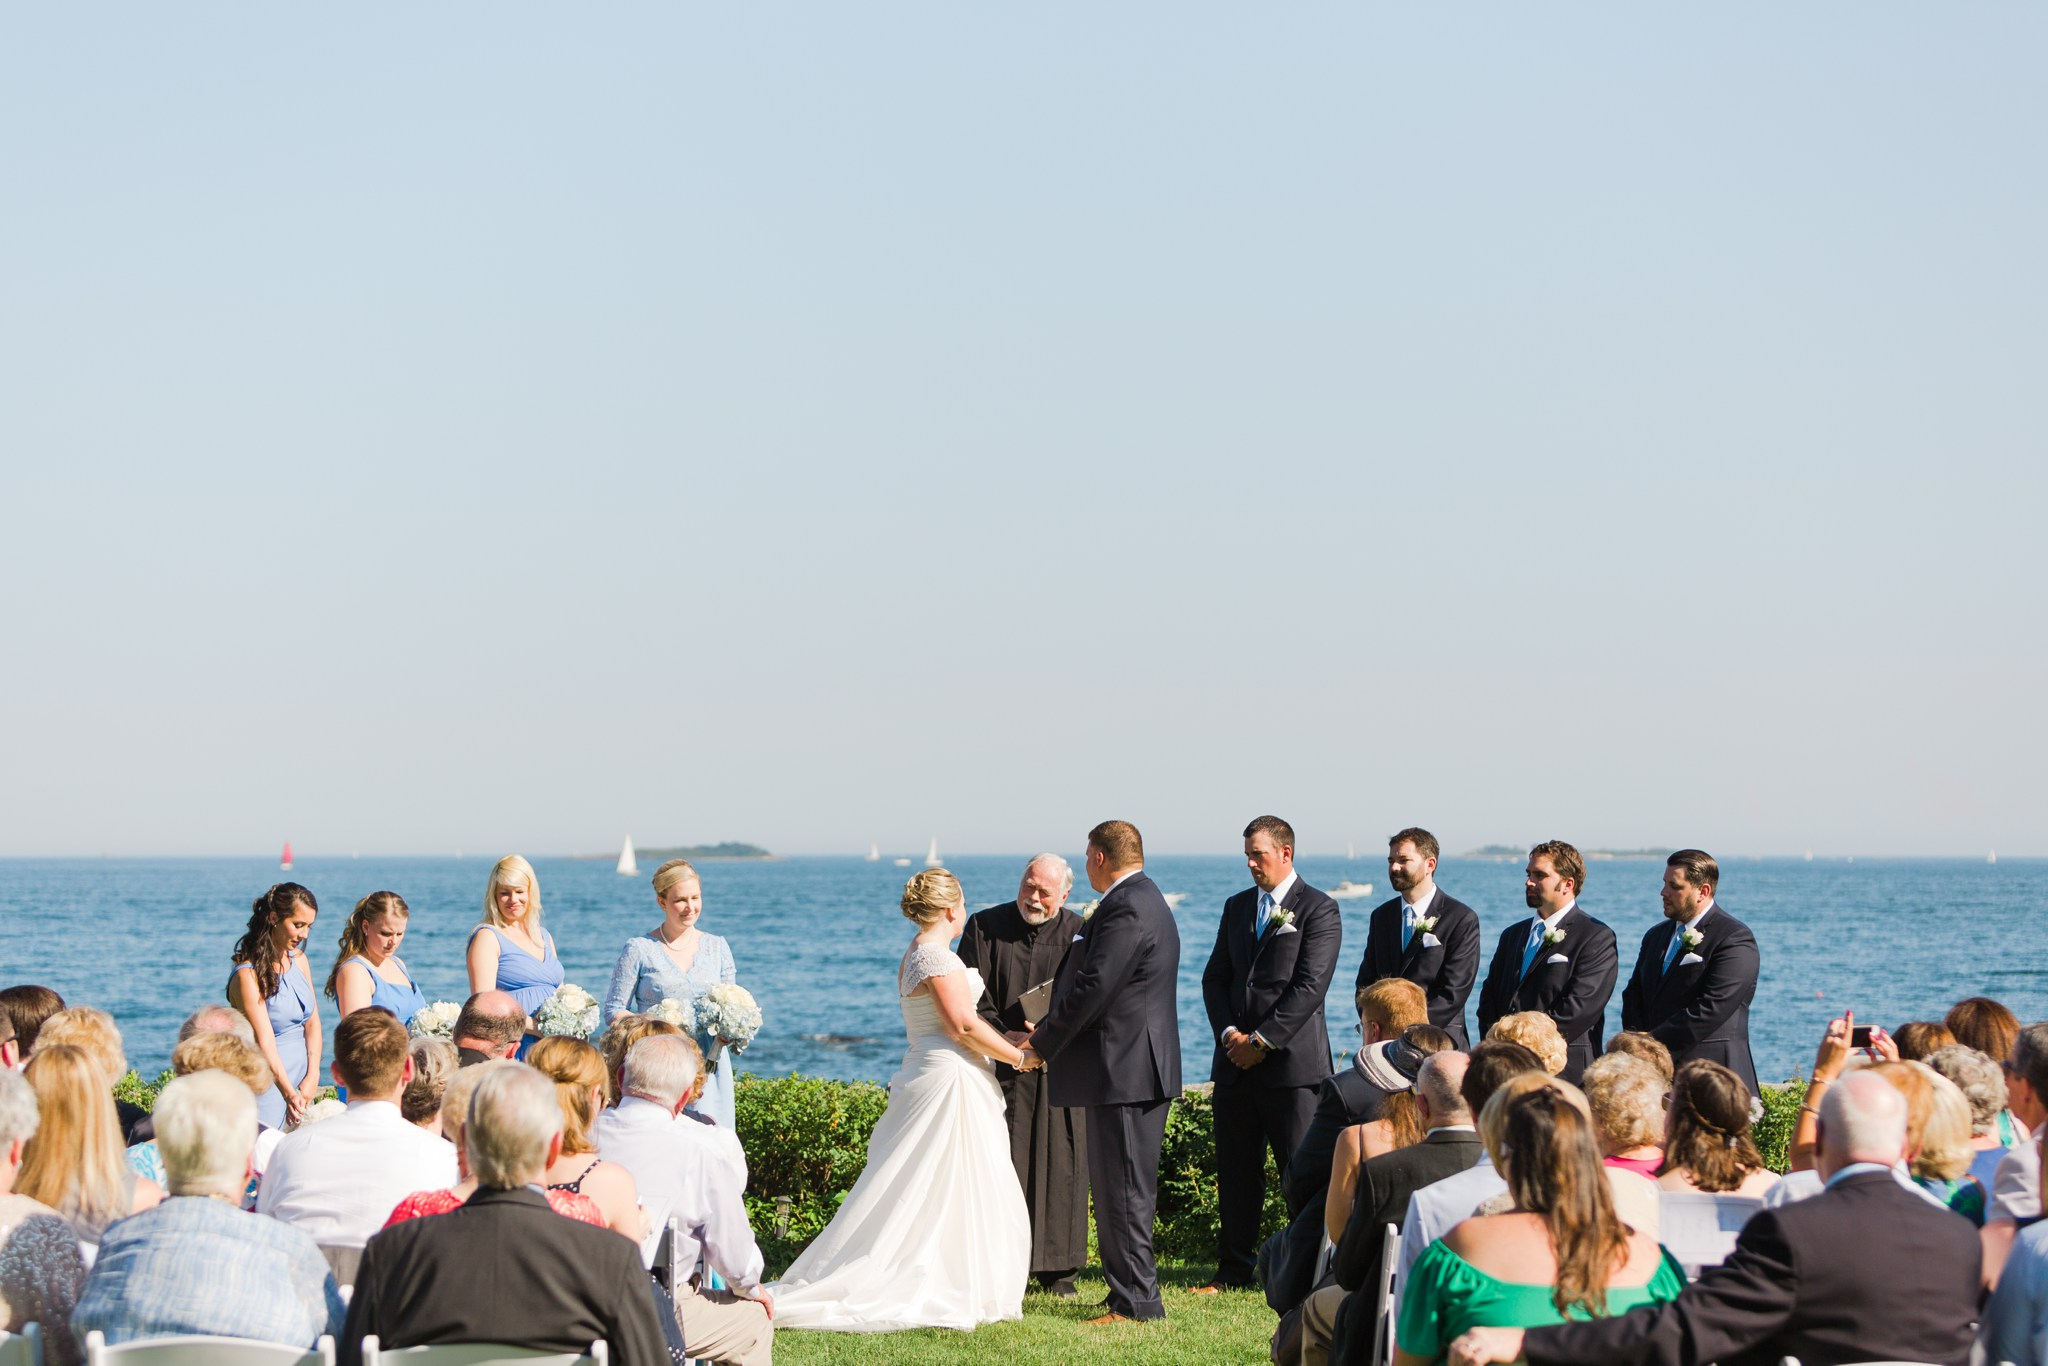 misselwood_endicott_college_wedding_photos_00052.JPG